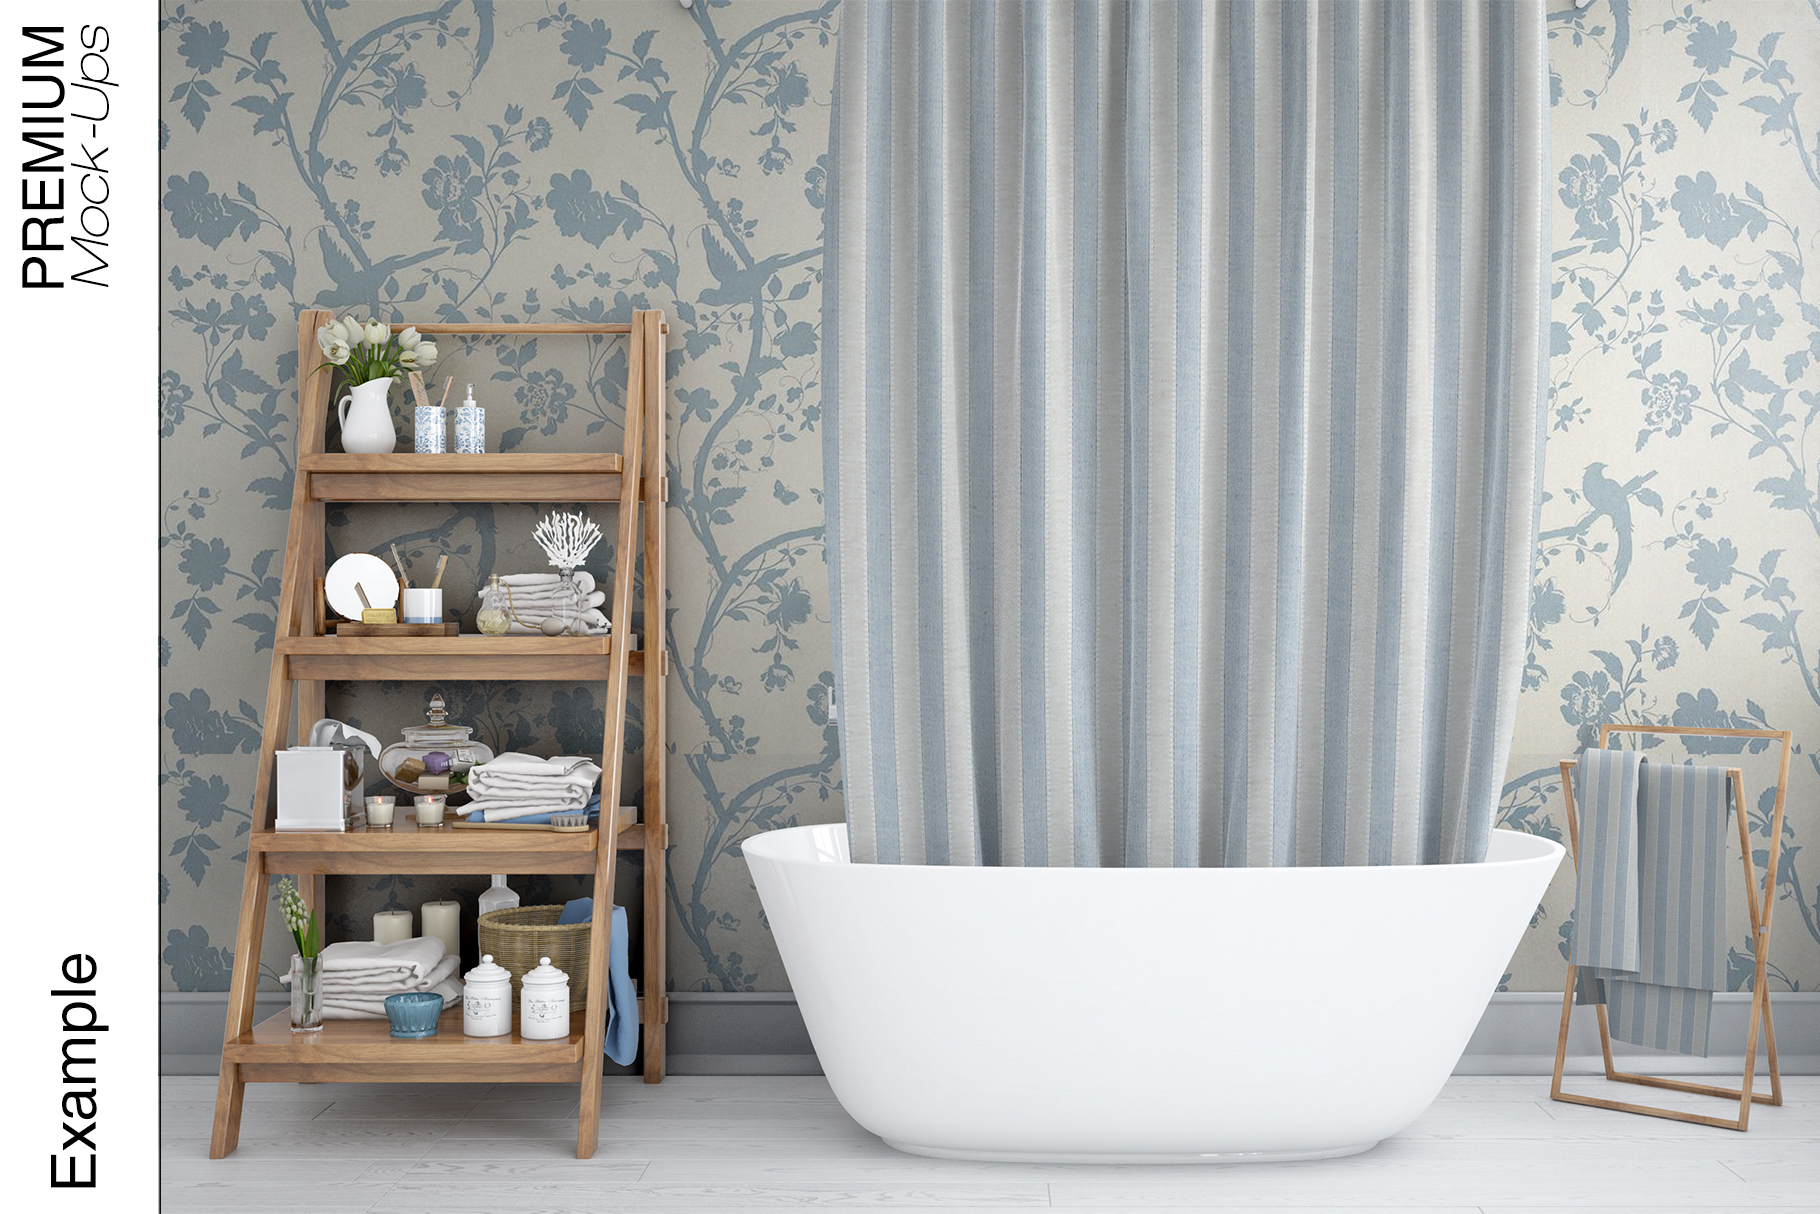 Bath Curtain Mockups example image 4